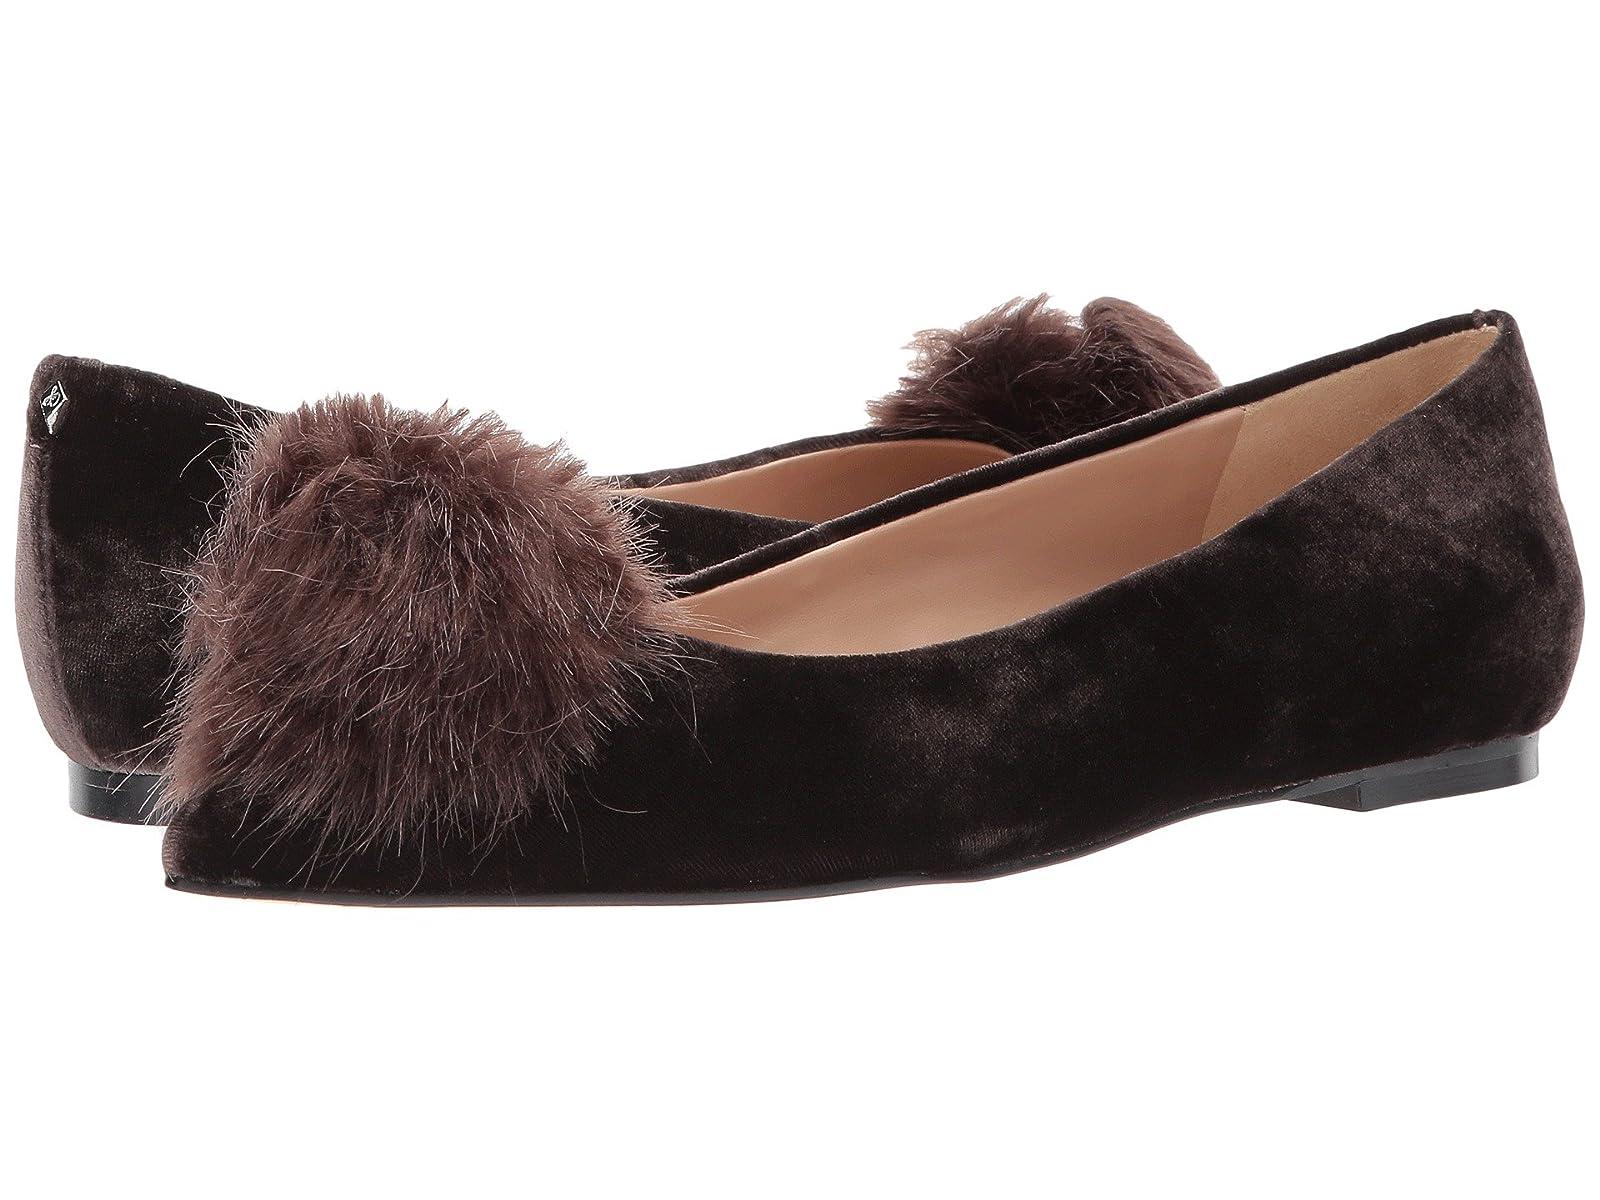 Sam Edelman RaddieCheap and distinctive eye-catching shoes